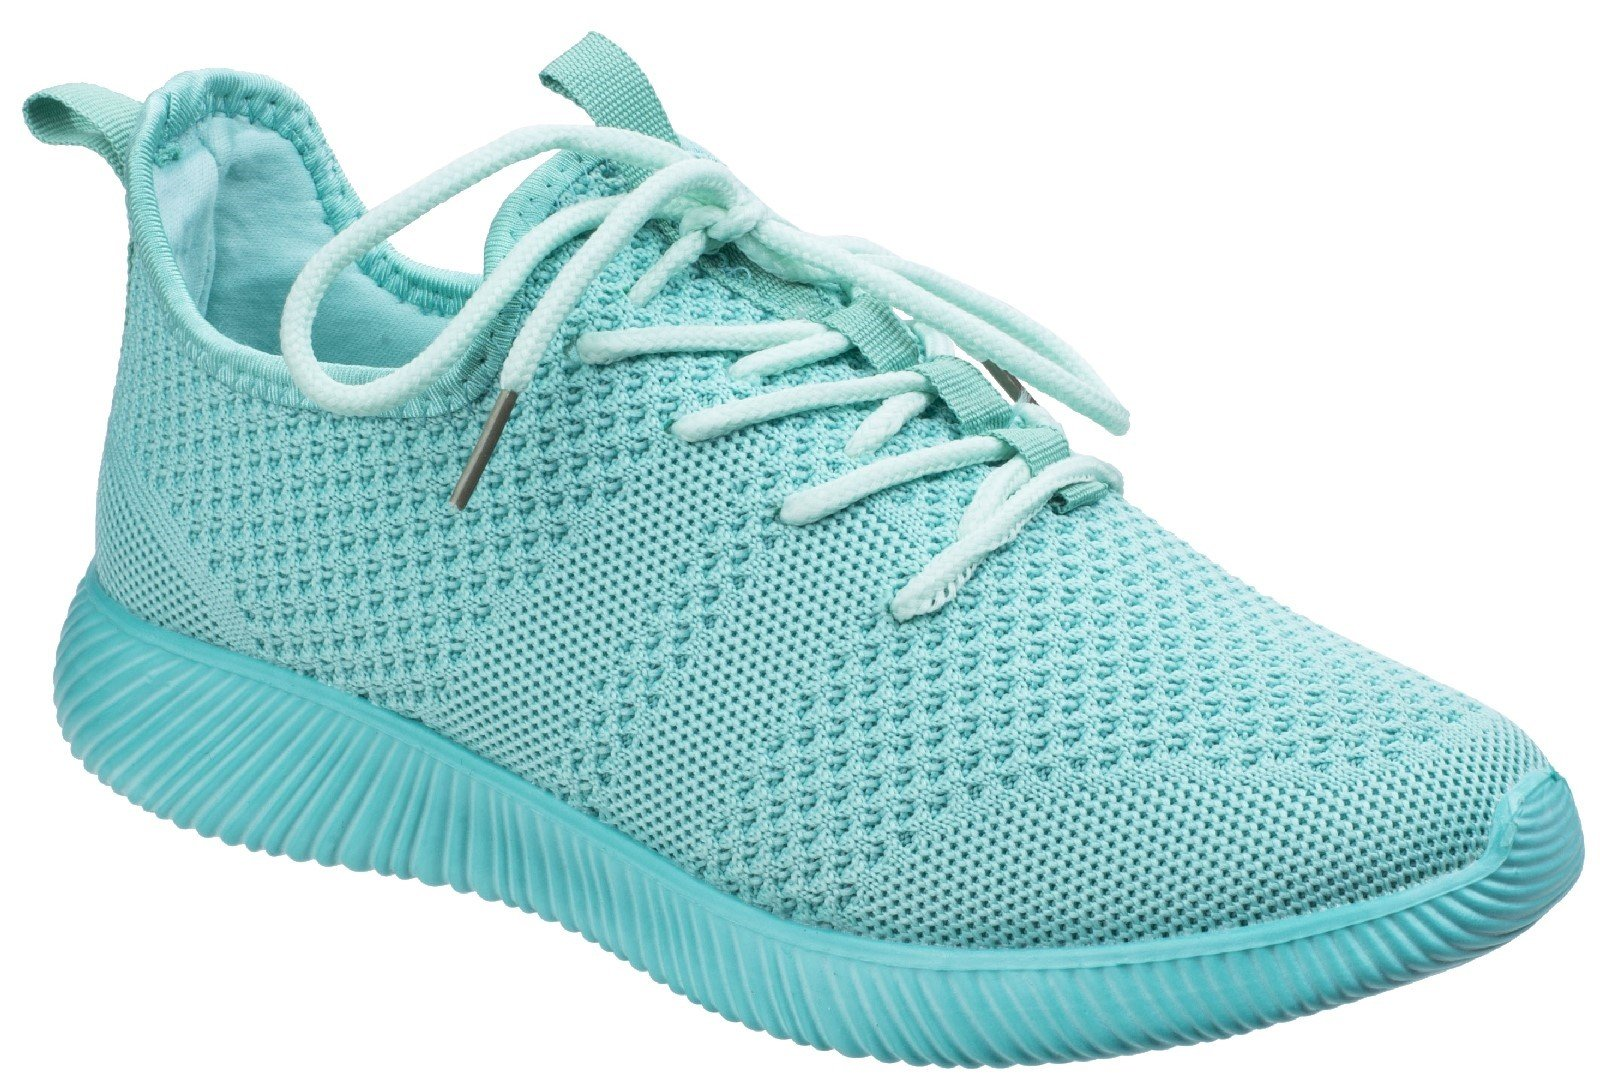 Divaz Women's Heidi Knit Trainer Grey 26327-43957 - Turquo 8